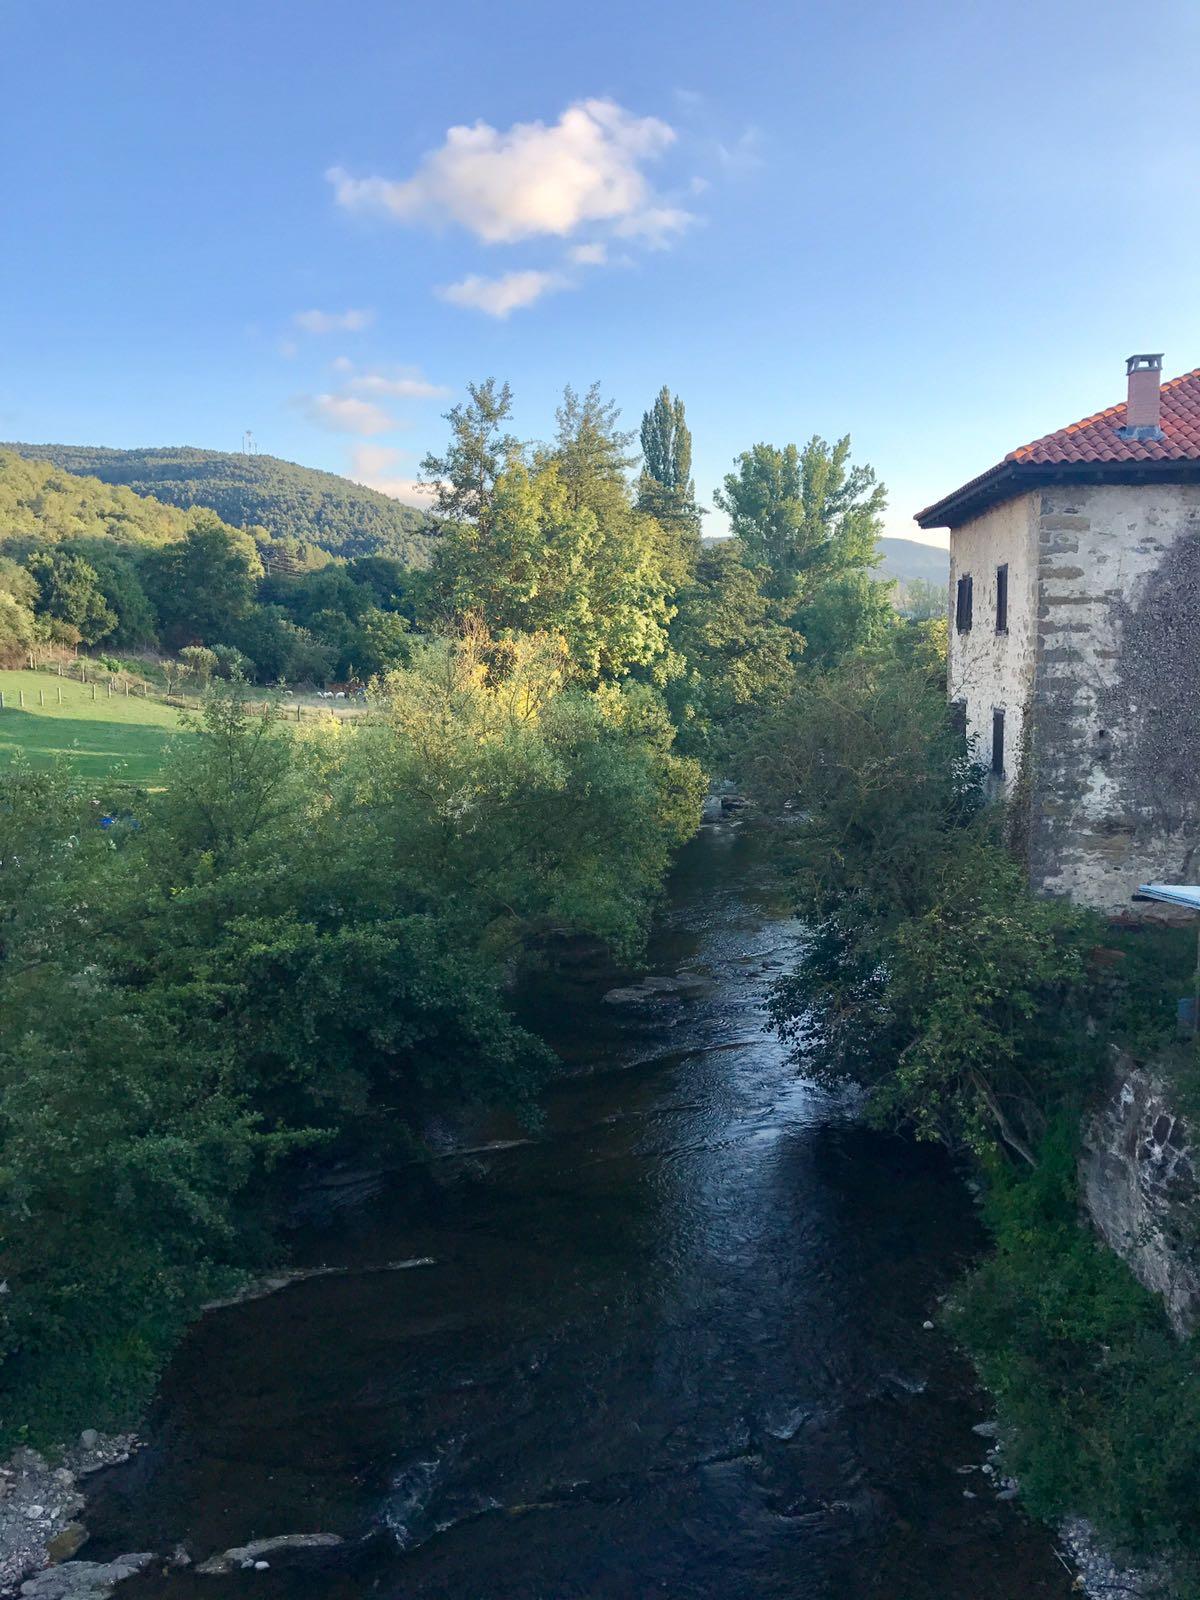 The river Arga passing alongside the town of Zubiri